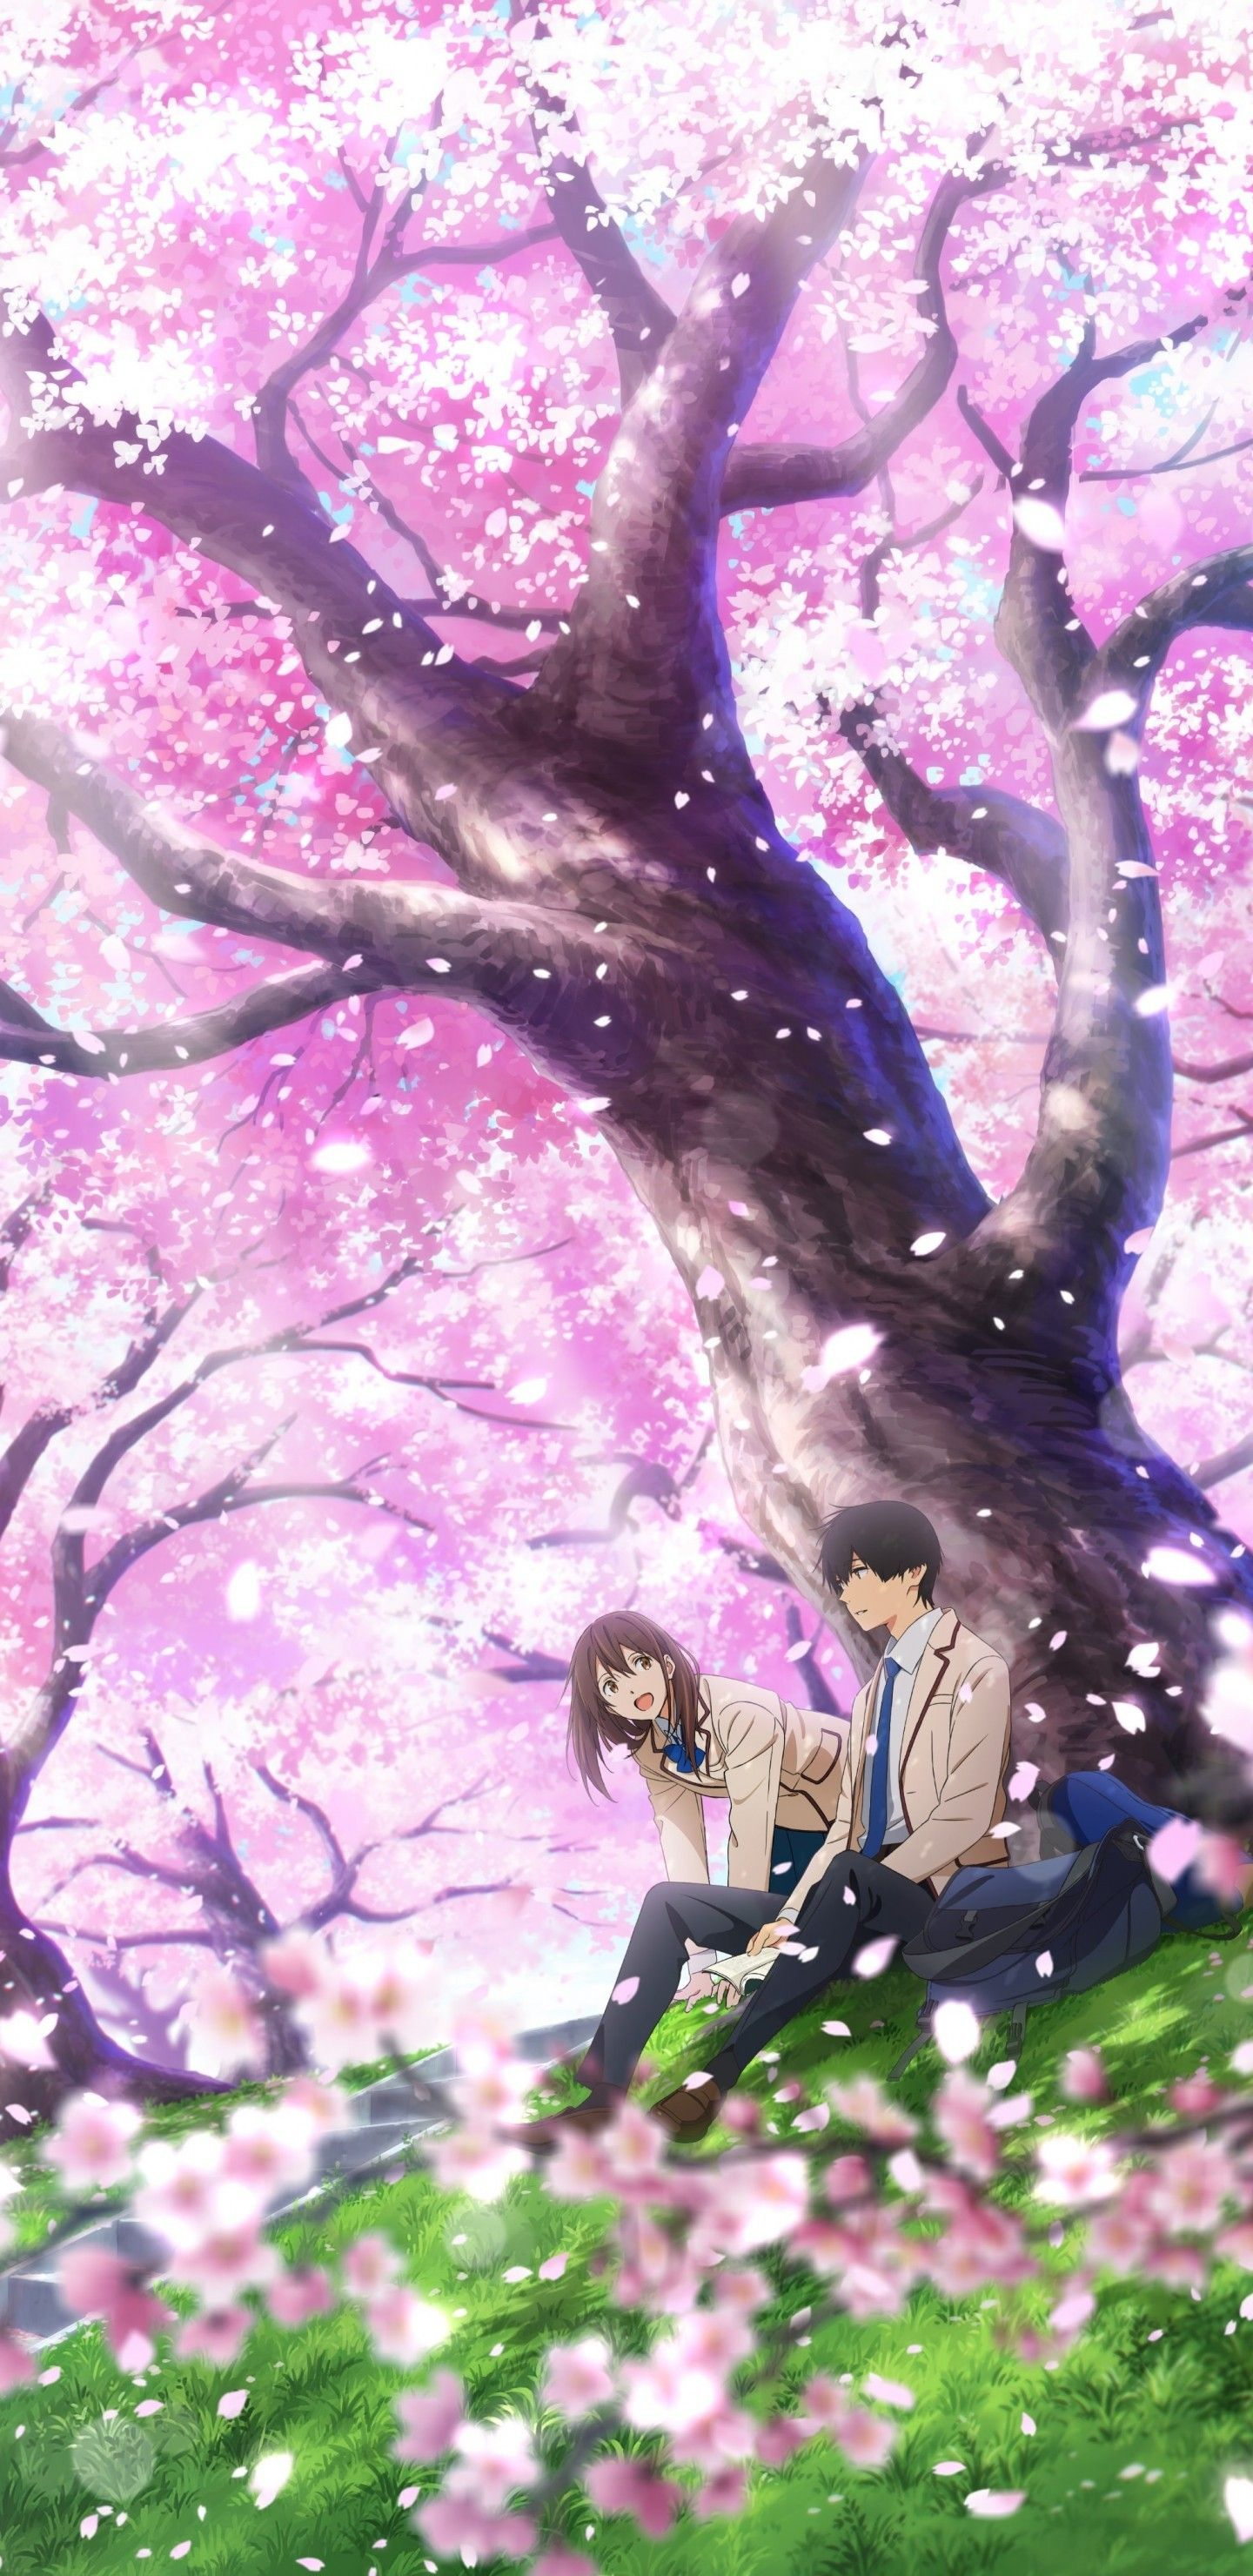 Download Anime Kimi No Suizou Wo Tabetai : download, anime, suizou, tabetai, Suizou, Tabetai, Wallpapers, Backgrounds, WallpaperAccess